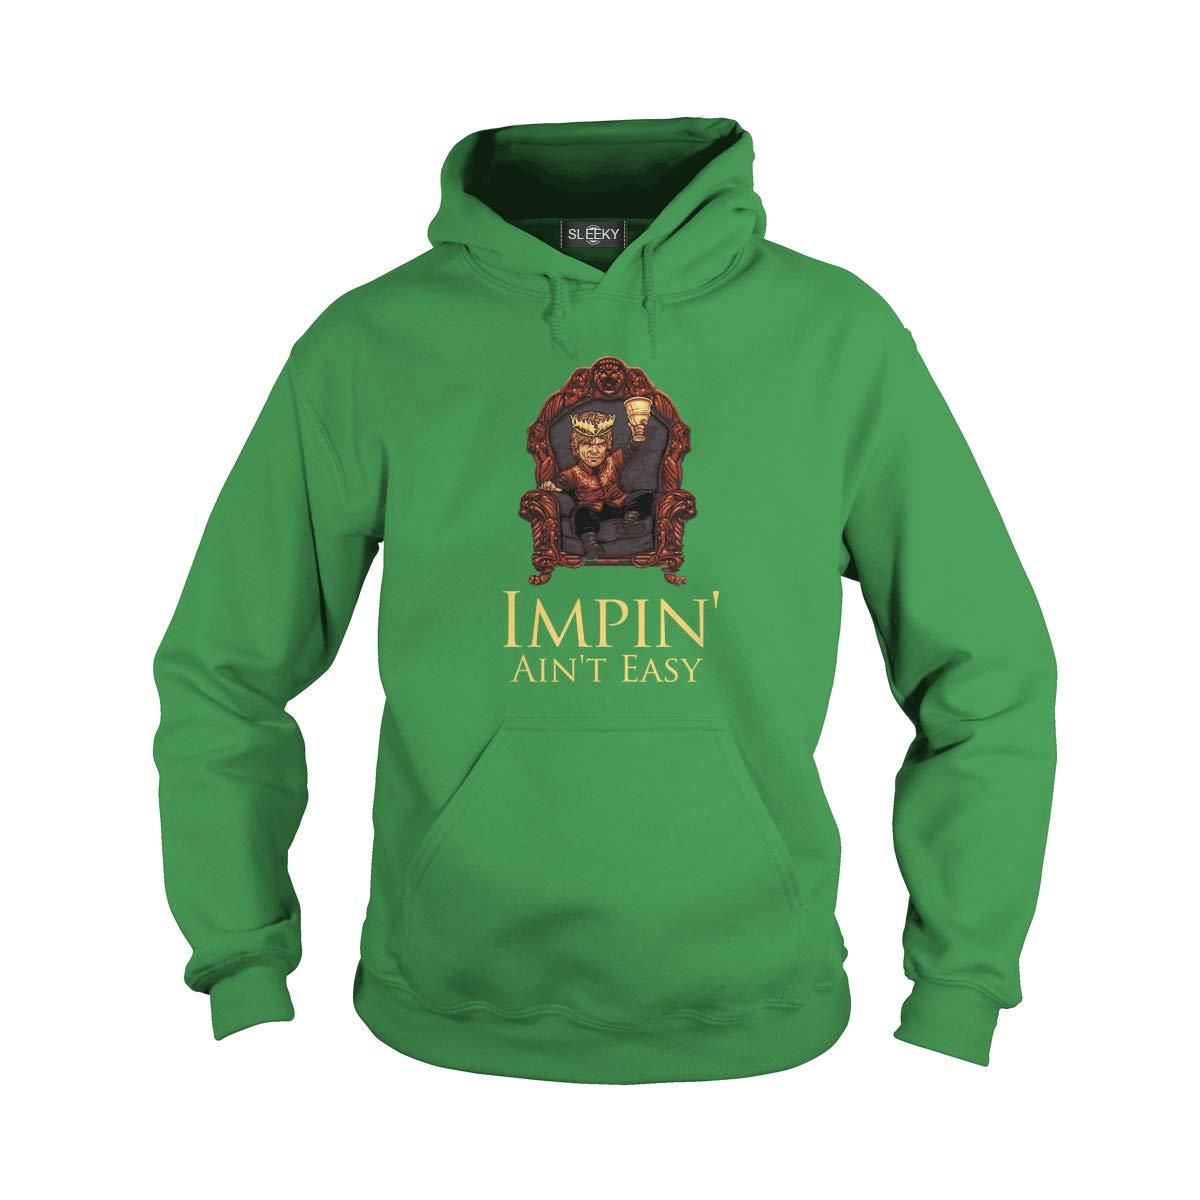 Game Throne Merchandise Gift T-Shirt Impin Aint Easy Tyron GOT Throne Fan